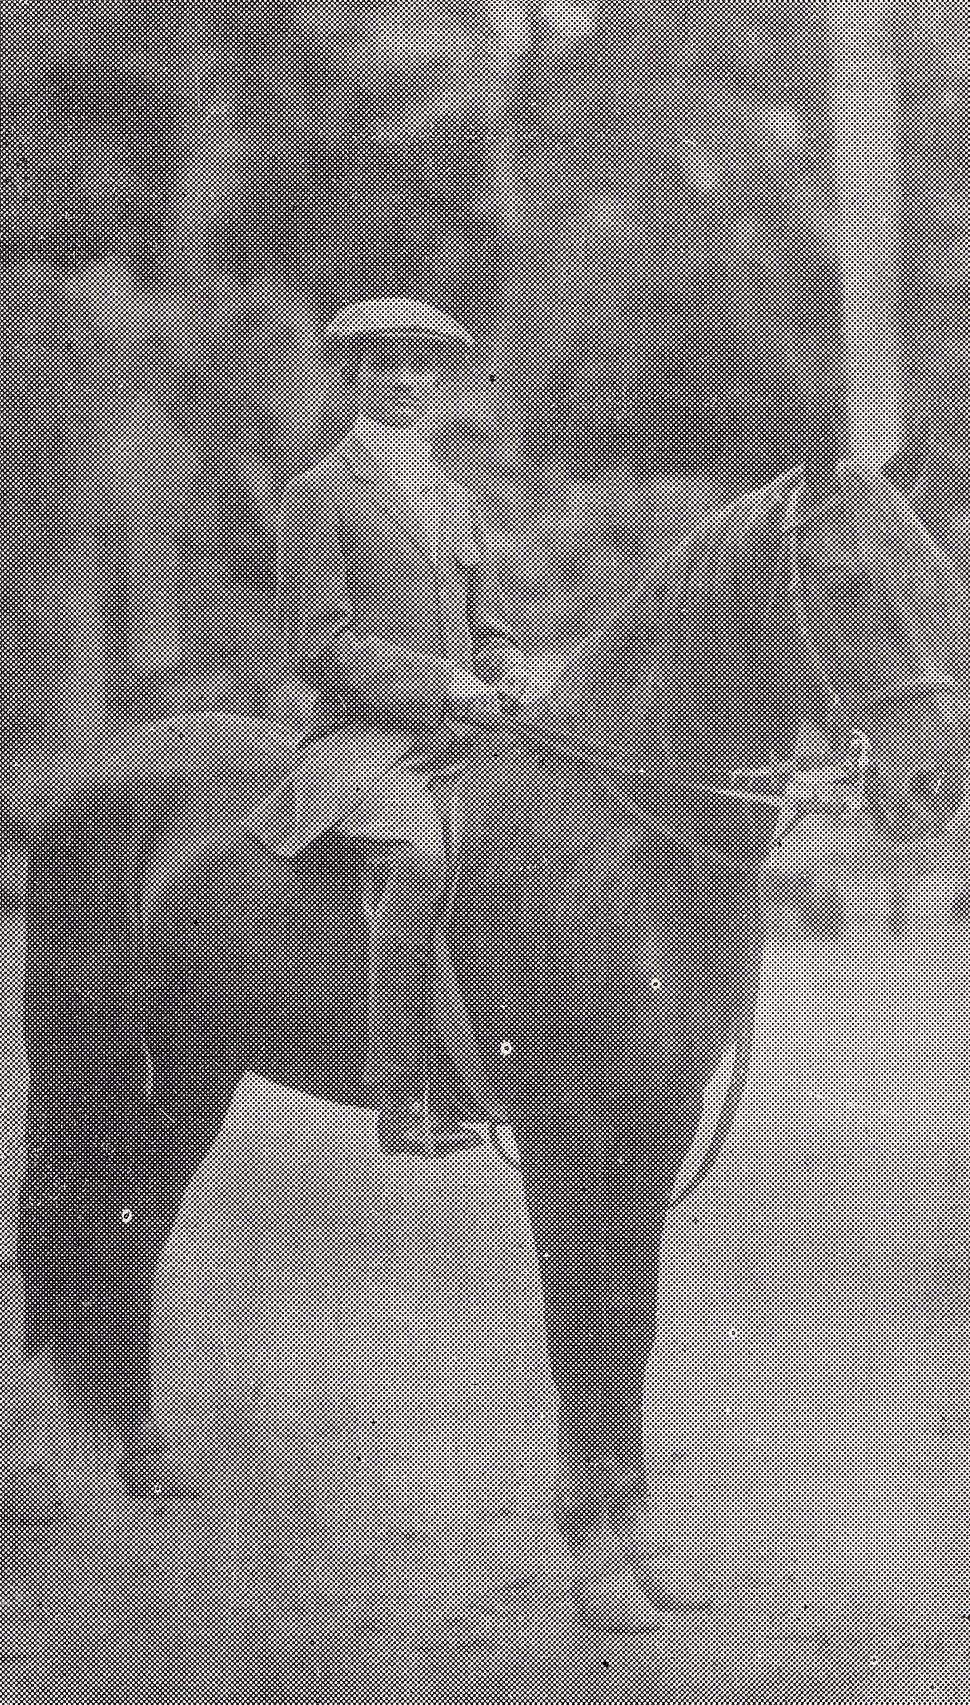 Henry Pedris (1888-1915)